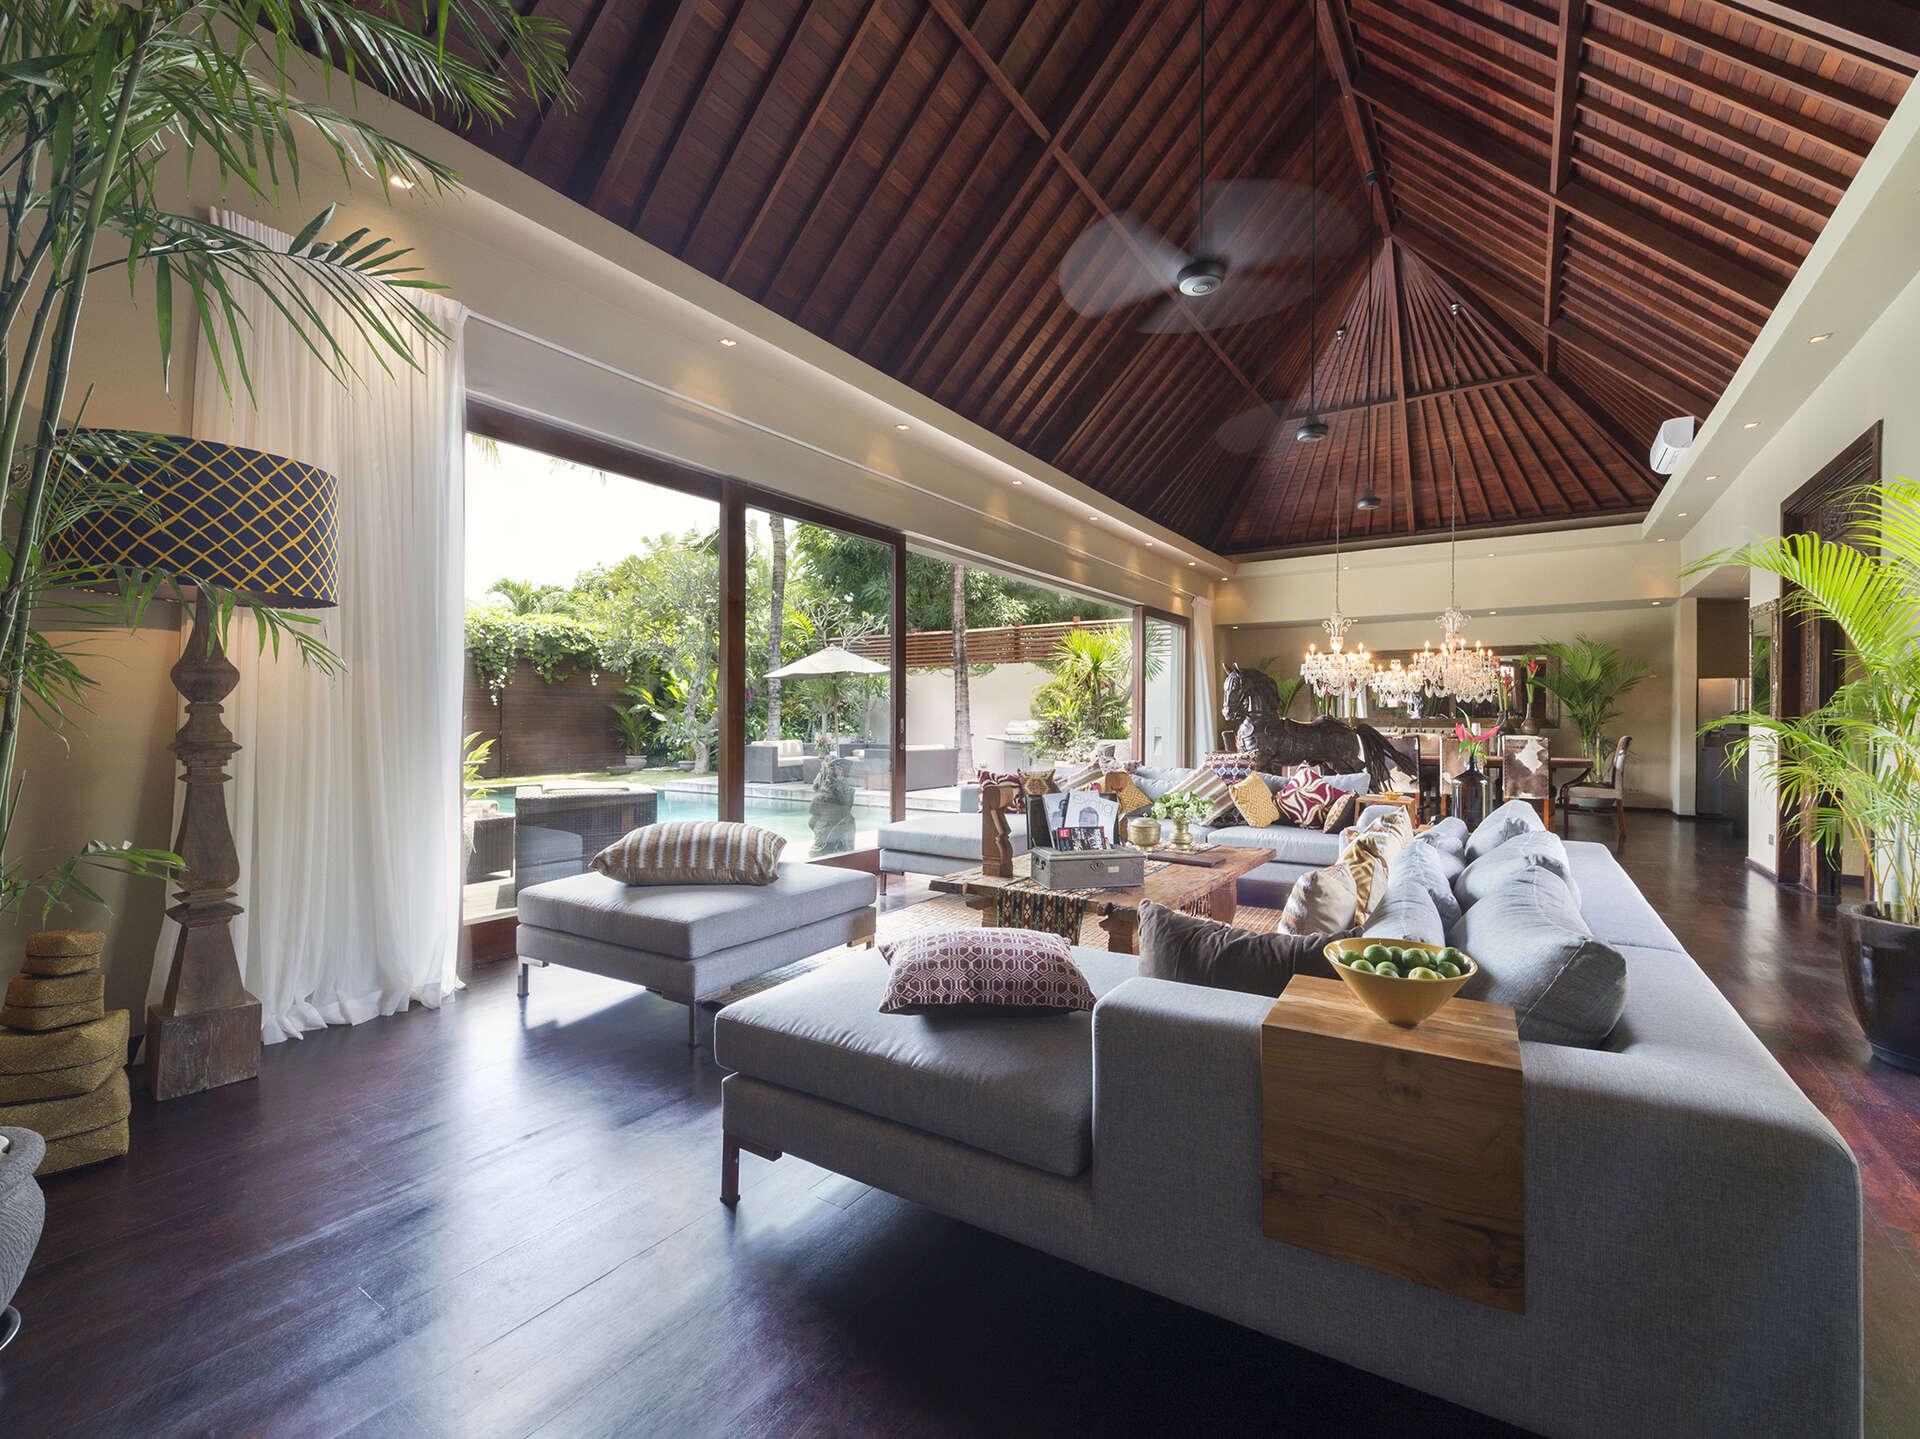 Luxury villa rentals asia - Indonesia - Bali - Seminyak - Eshara 1 - Image 1/16